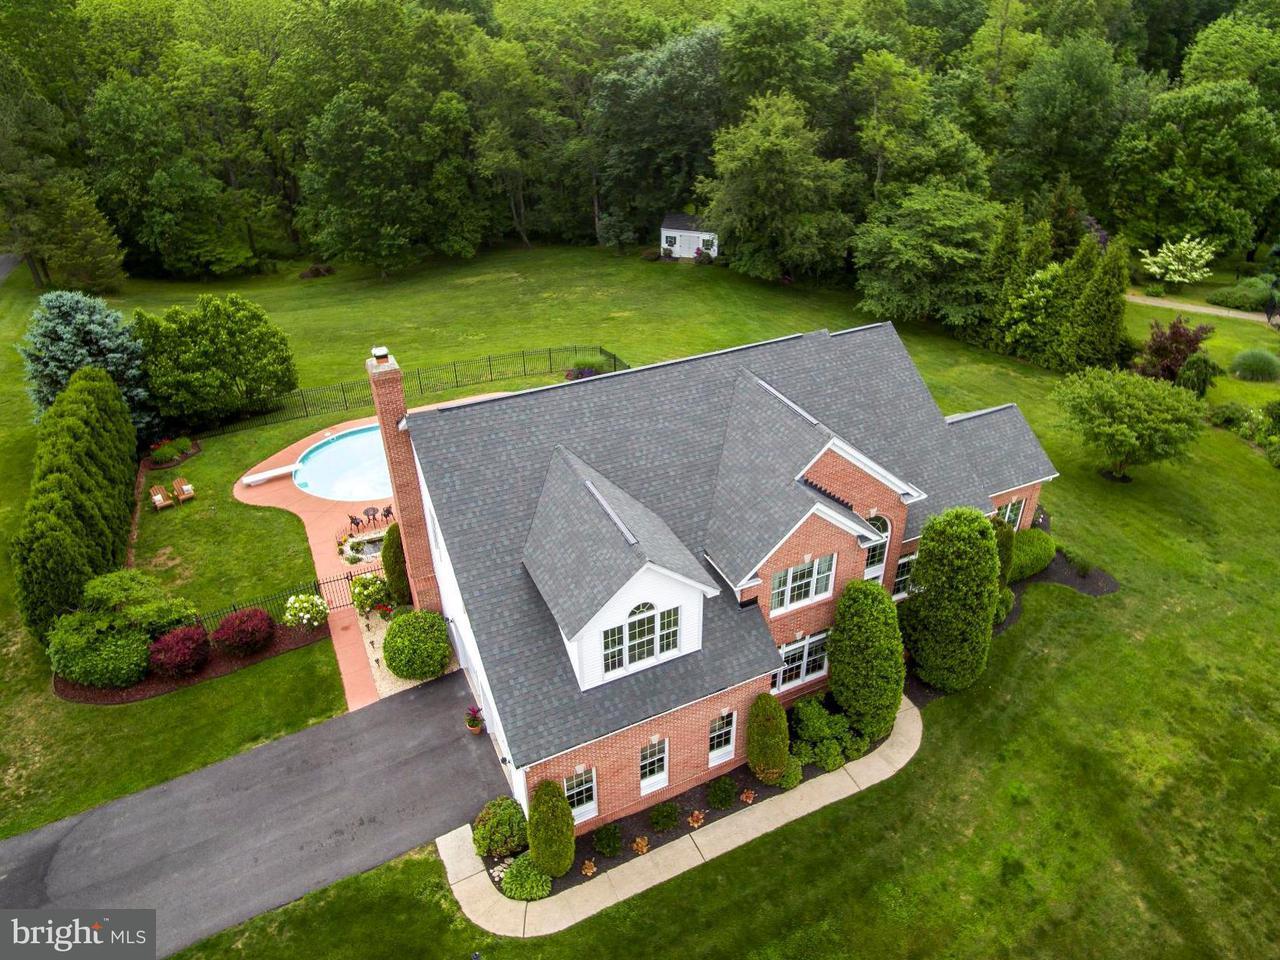 Single Family Home for Sale at 1305 BROCKTON Drive 1305 BROCKTON Drive Eldersburg, Maryland 21784 United States